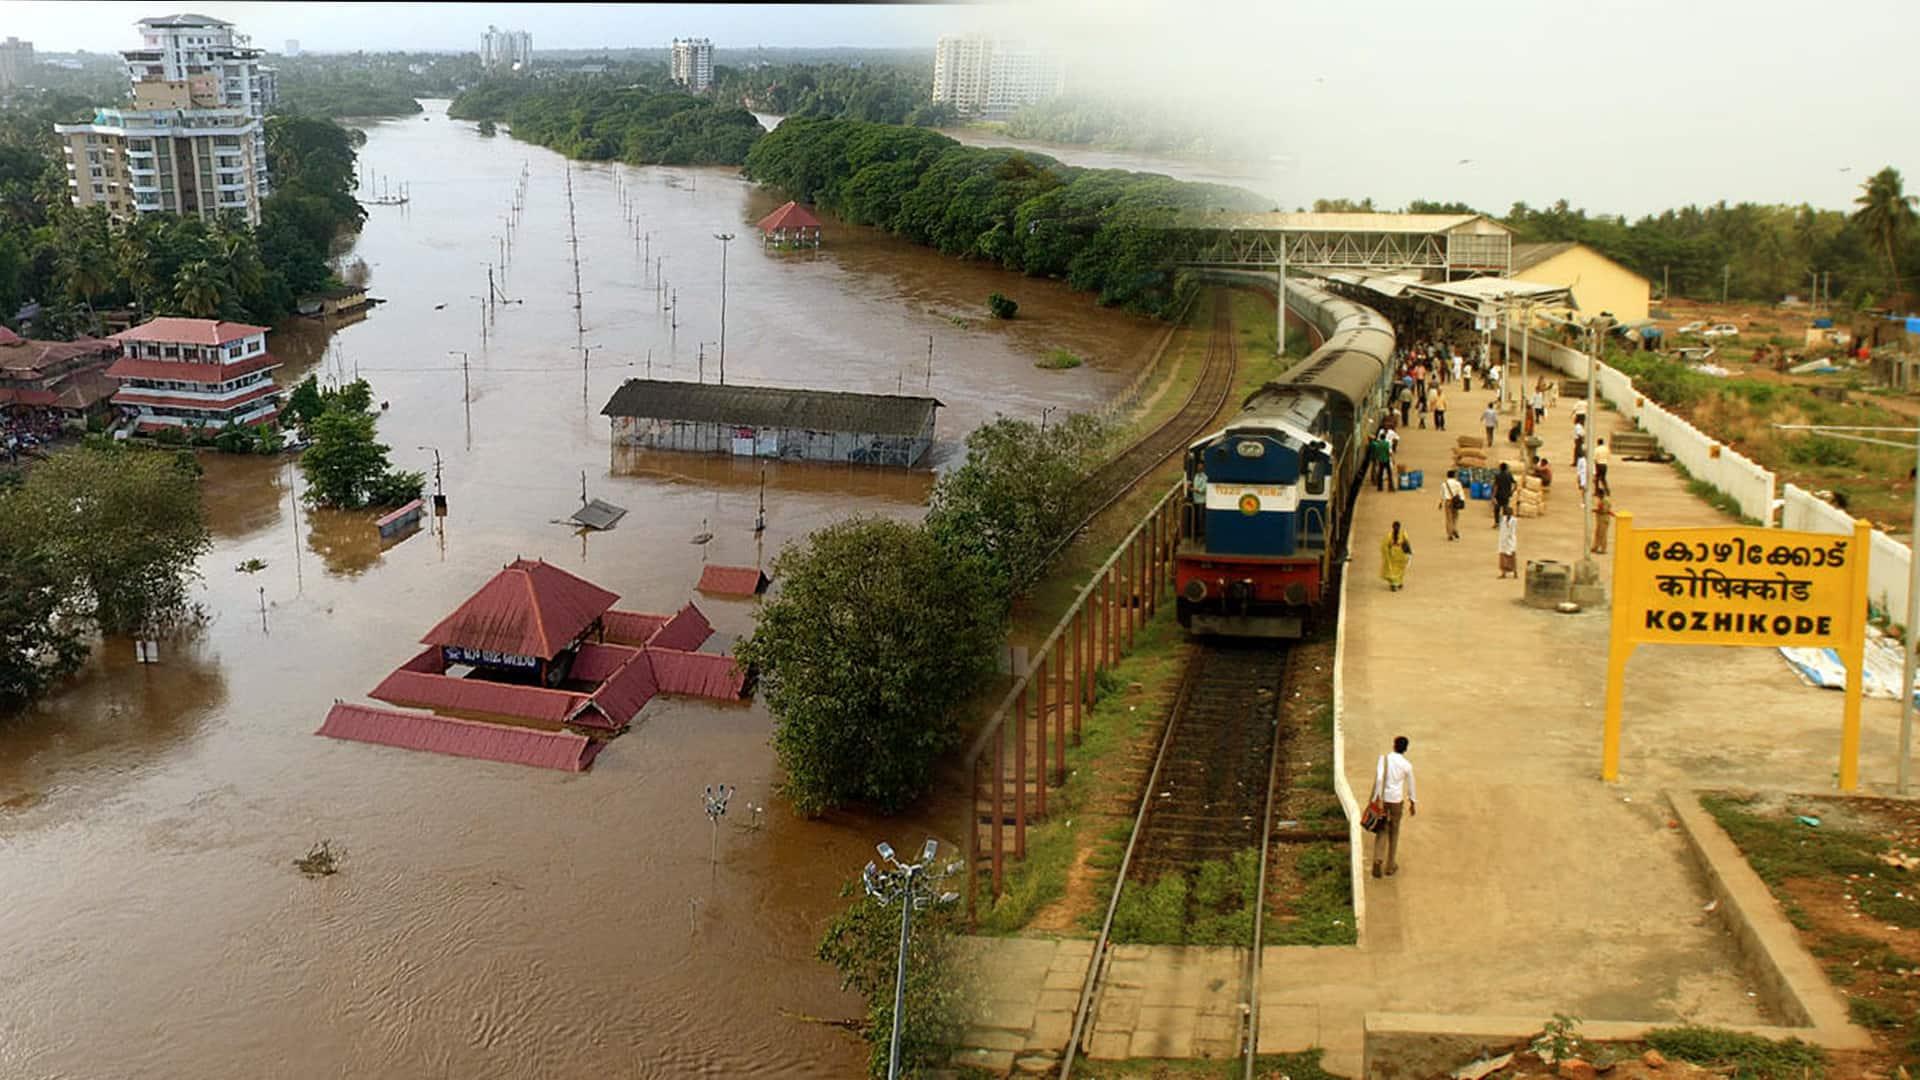 Kerala floods train service resumed  Kayankulam Kottayam Ernakulam Palakkad Shoranur Kozhikkode